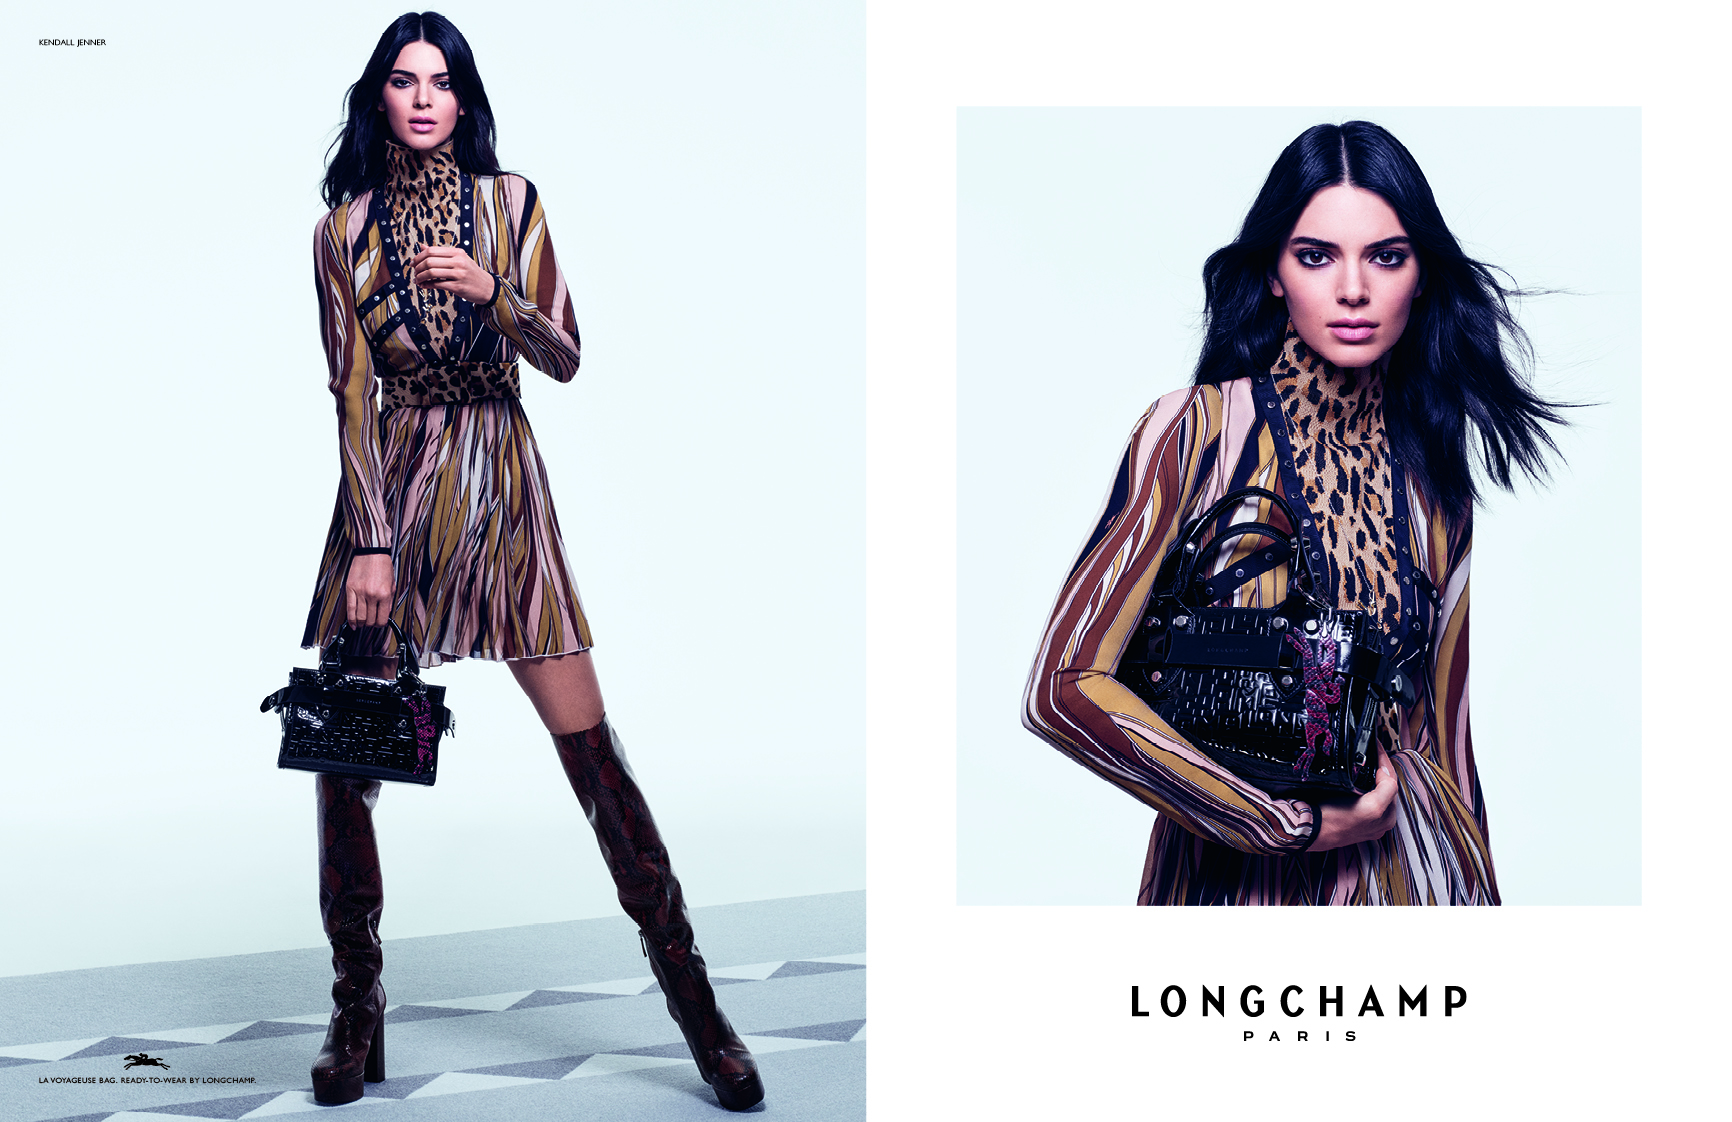 H Κendall Jenner μόλις κράτησε τις It-bags της νέας σεζόν, στην καμπάνια της Longchamp